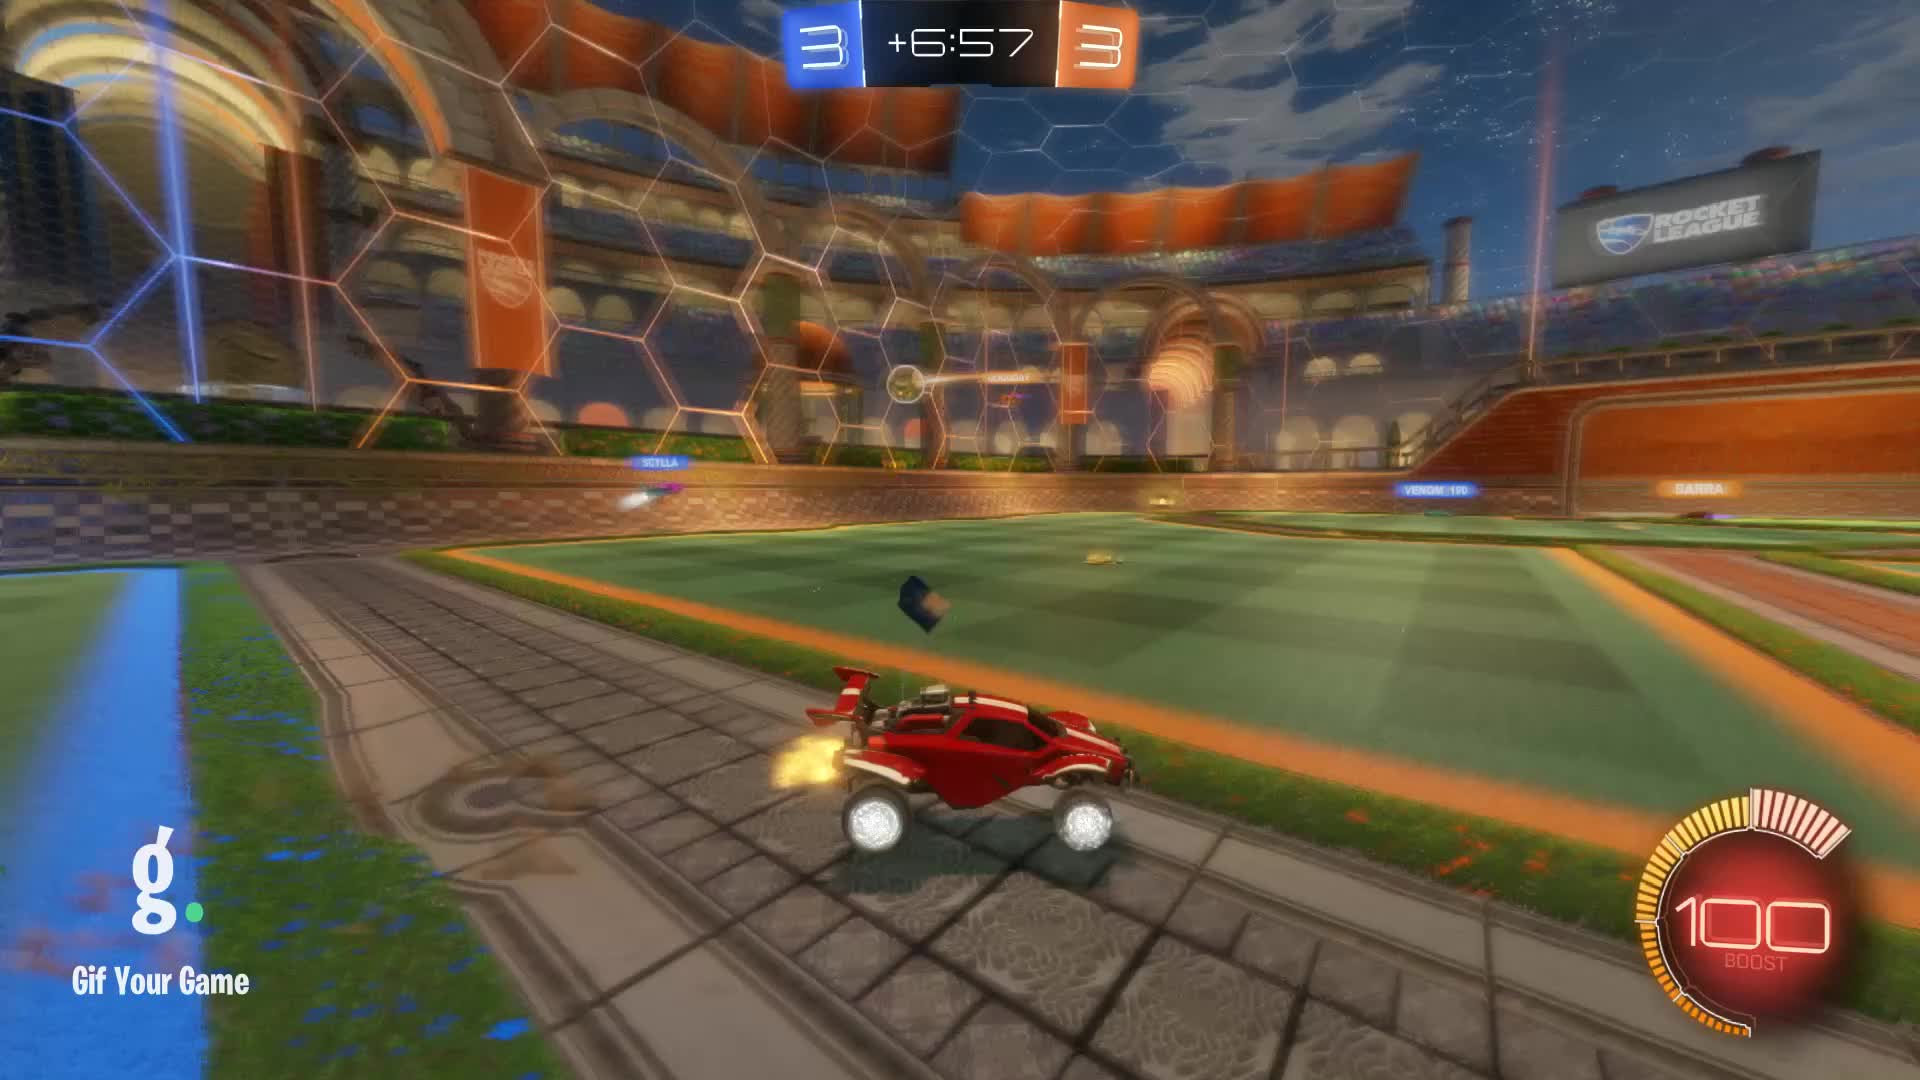 Gif Your Game, GifYourGame, Goal, Kenbo., Rocket League, RocketLeague, Goal 7: Kenbo. GIFs